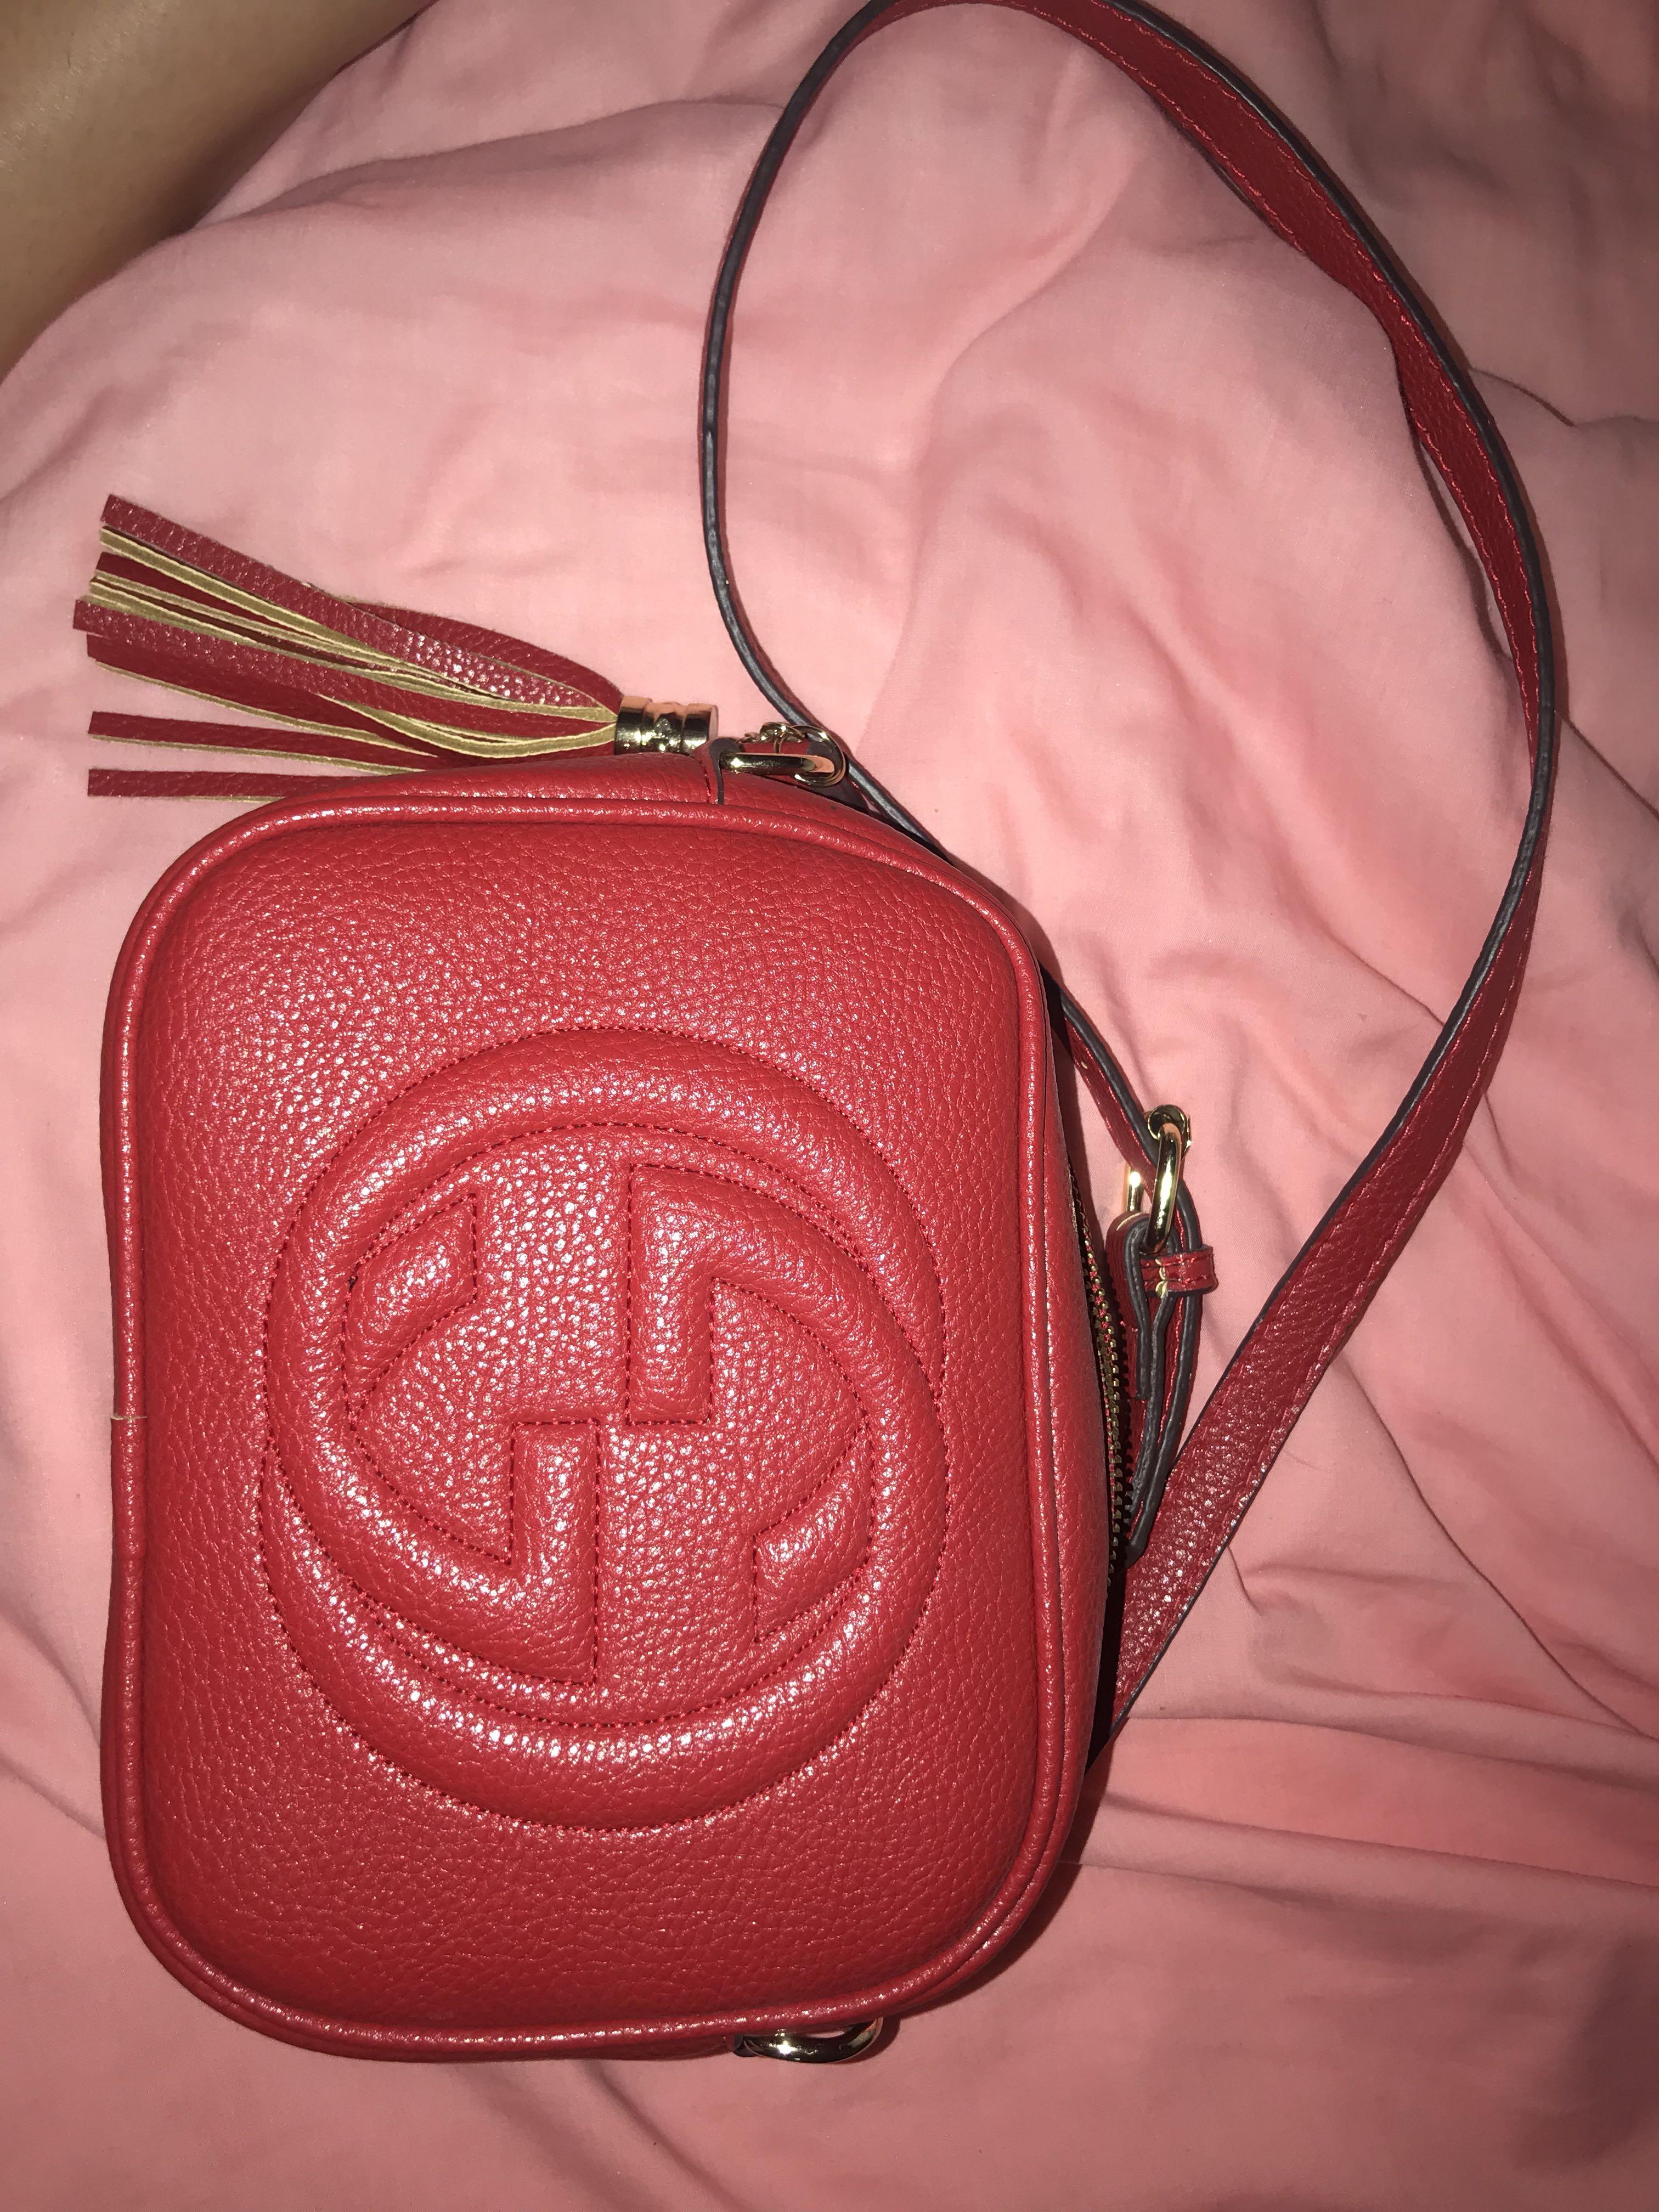 Gucci Soho Bag - Red